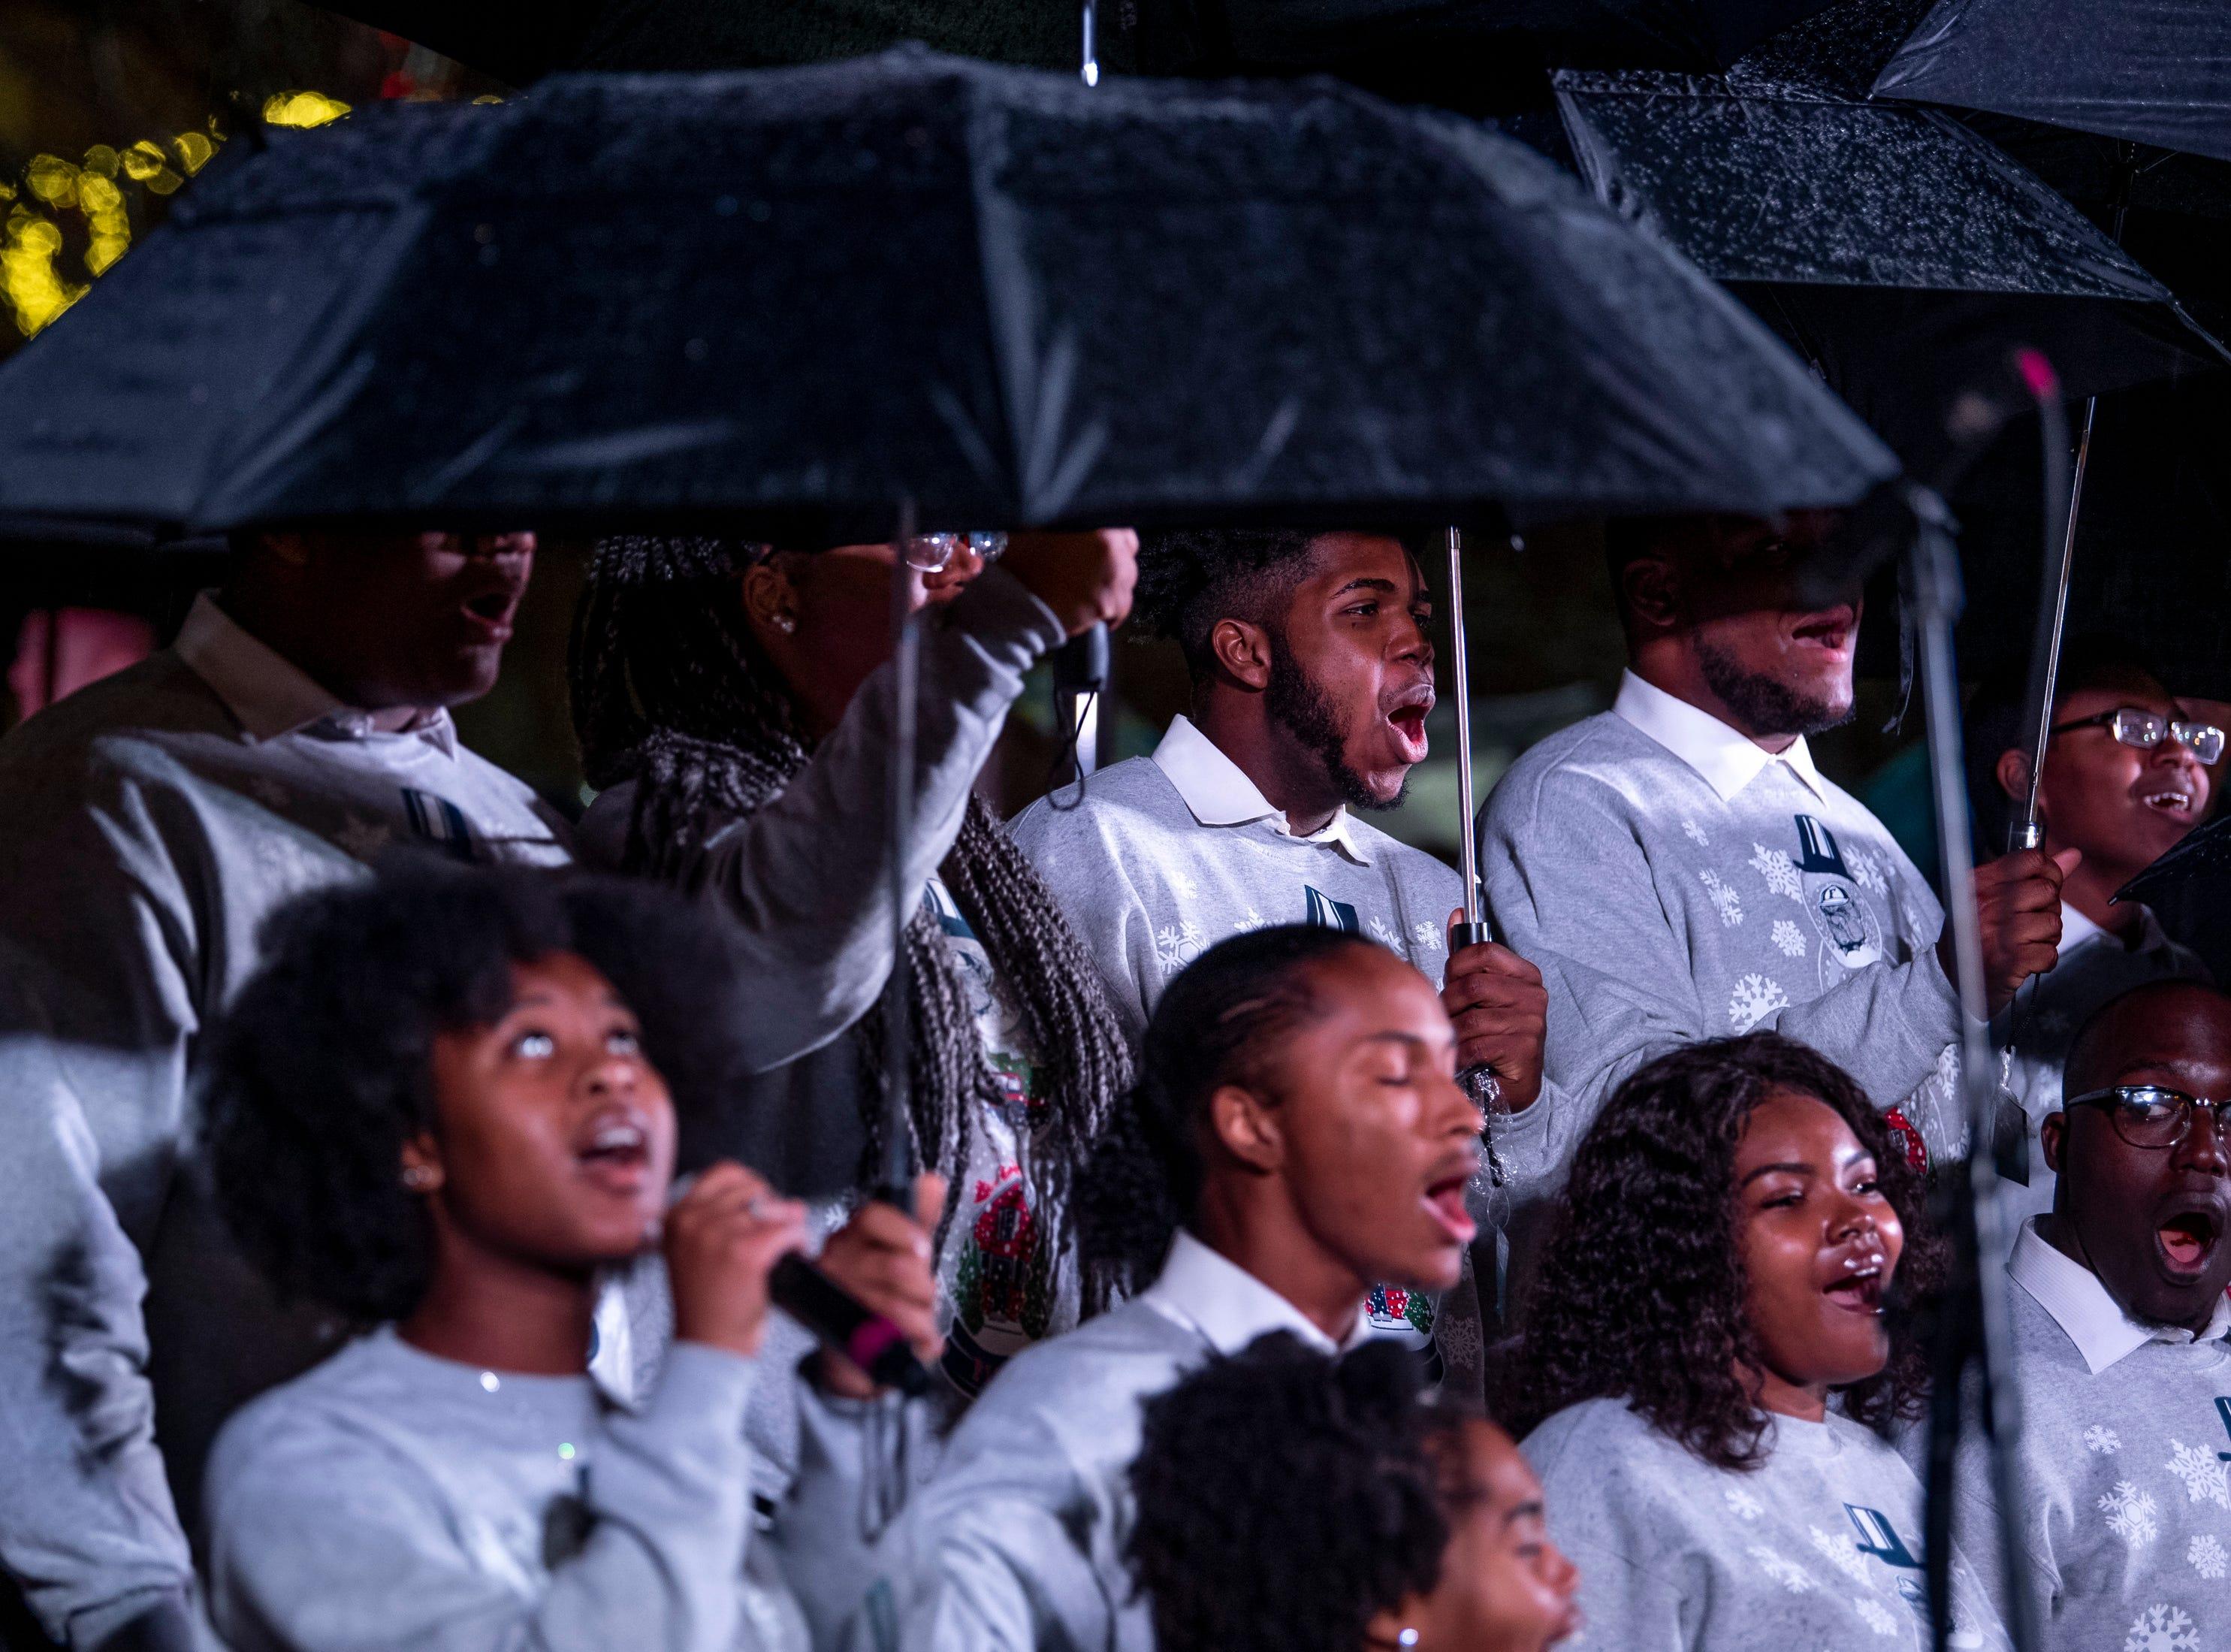 The Fisk Jubilee Singers perform as rain falls during the Metro Nashville Christmas Tree Lighting event at Public Square Park in Nashville, Tenn., Friday, Nov. 30, 2018.